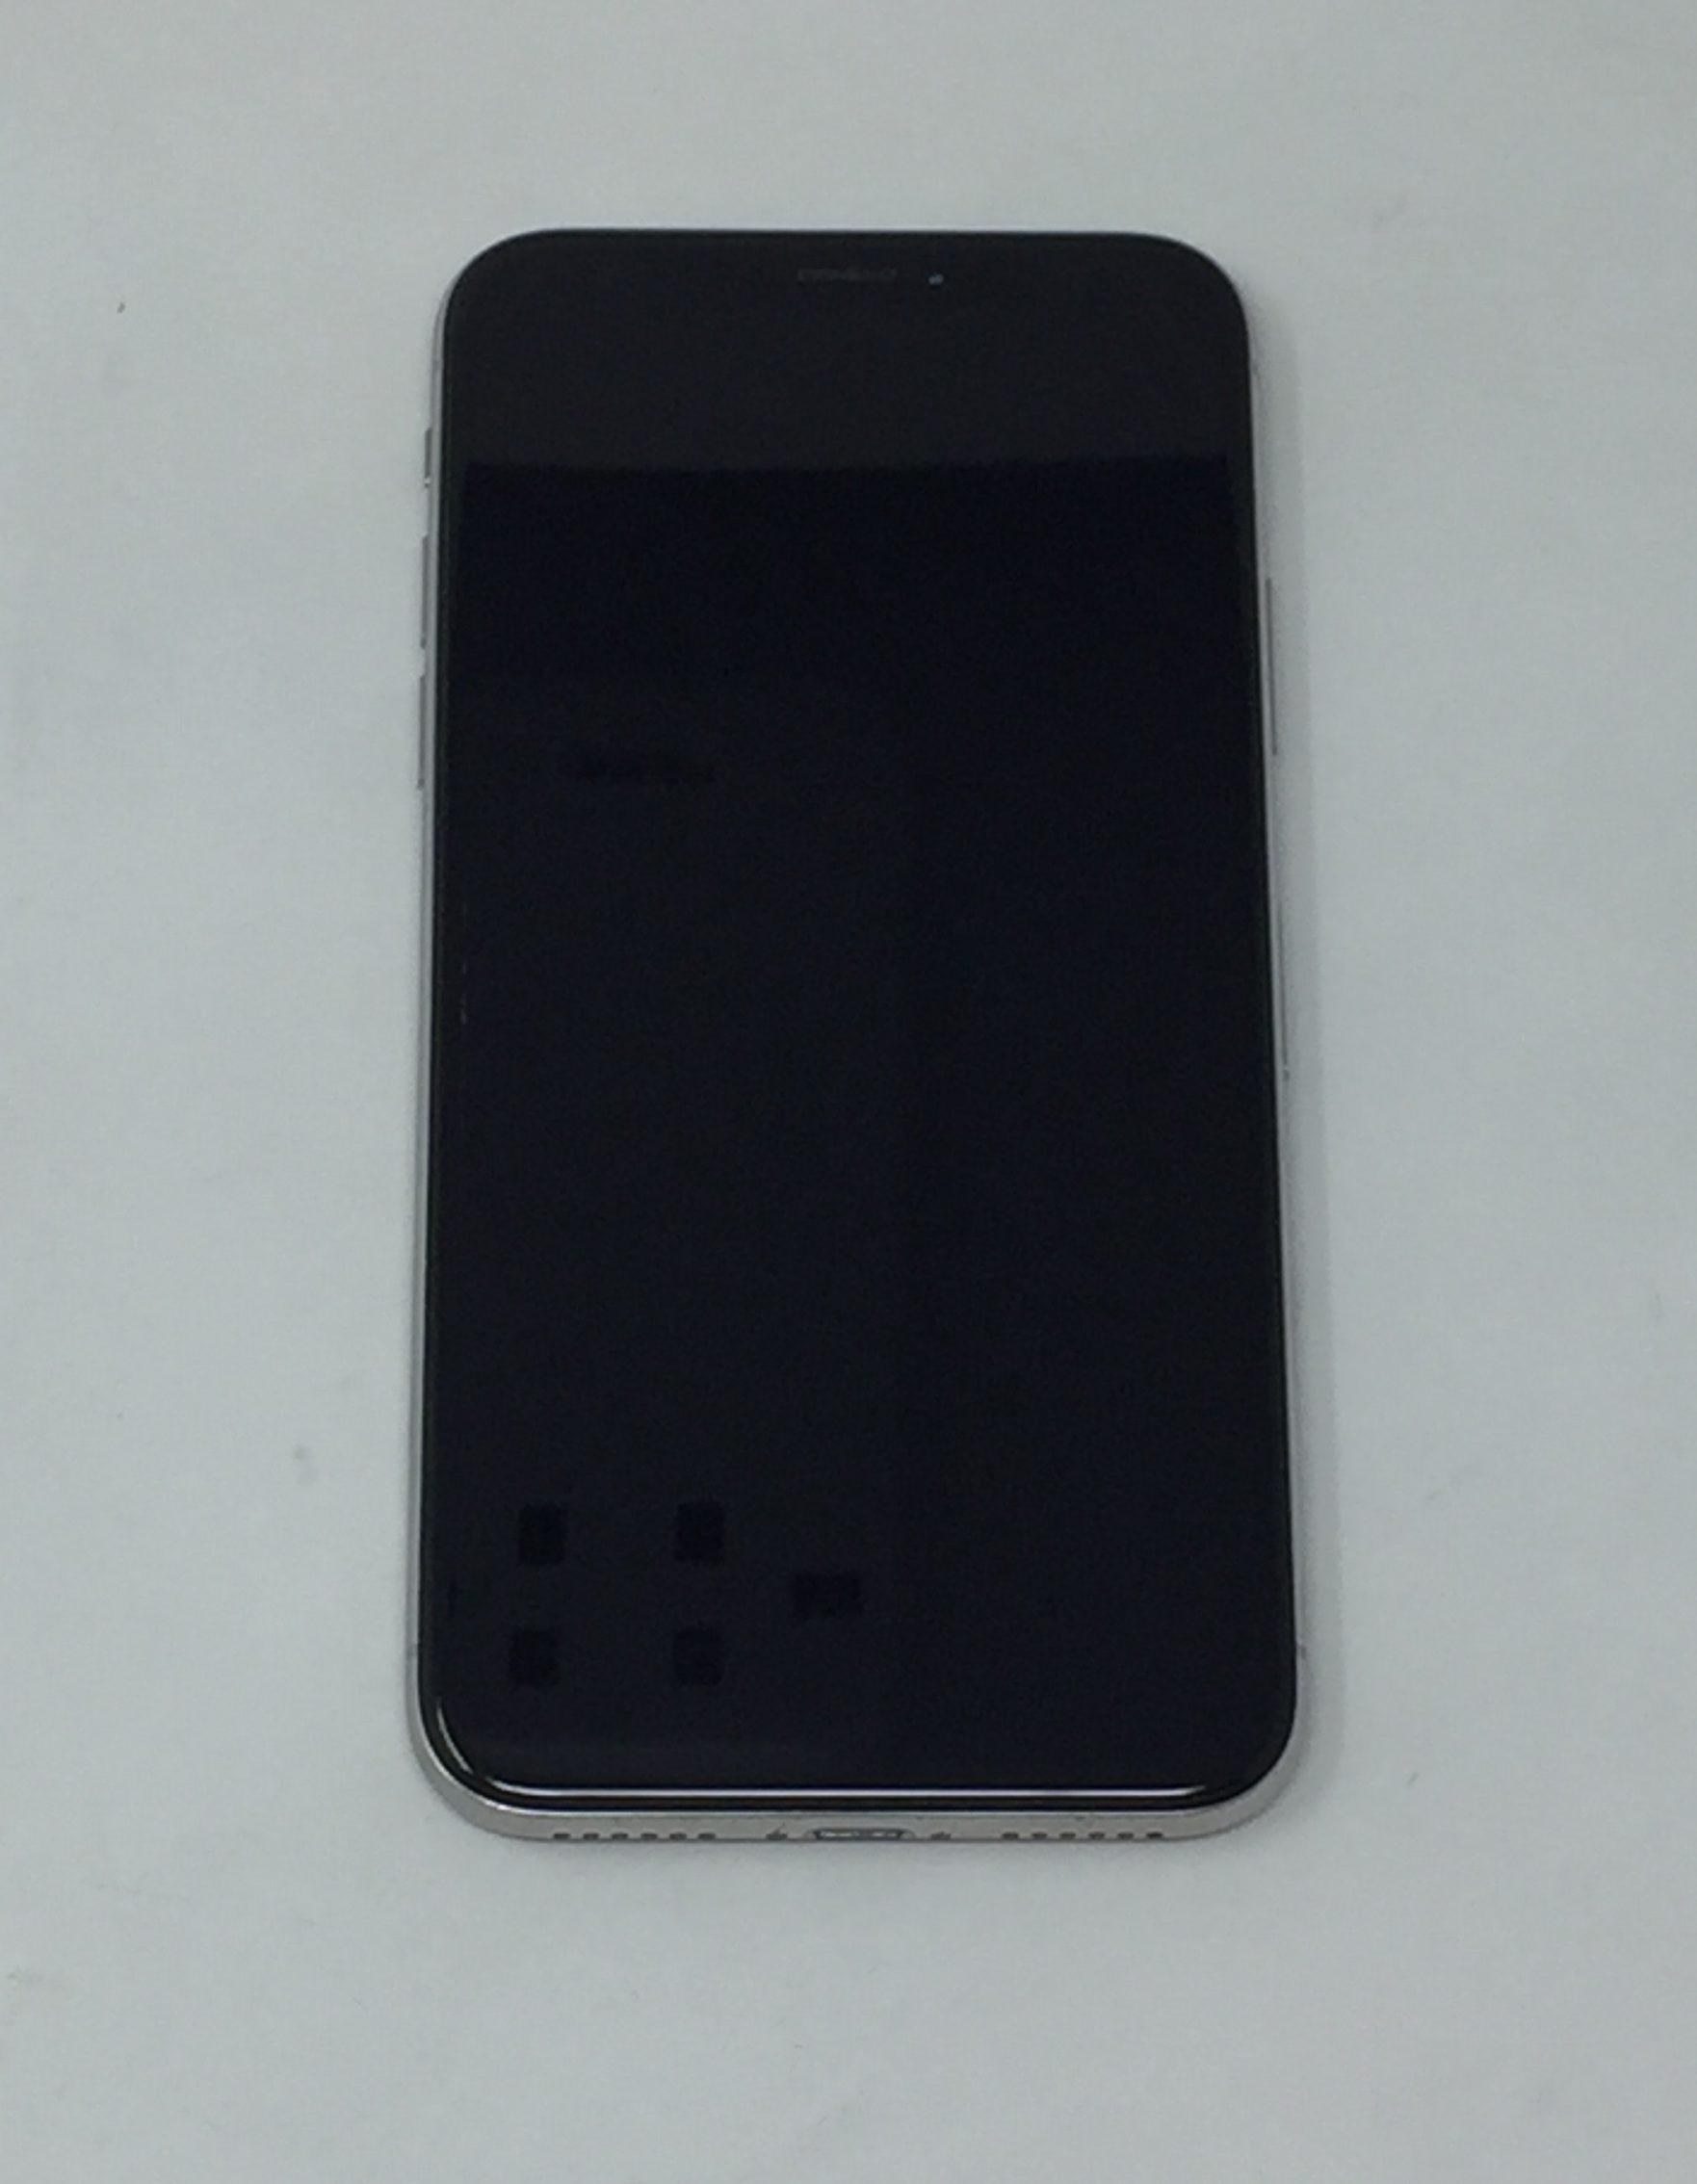 iPhone X 256GB, 256 GB, Silver, imagen 1